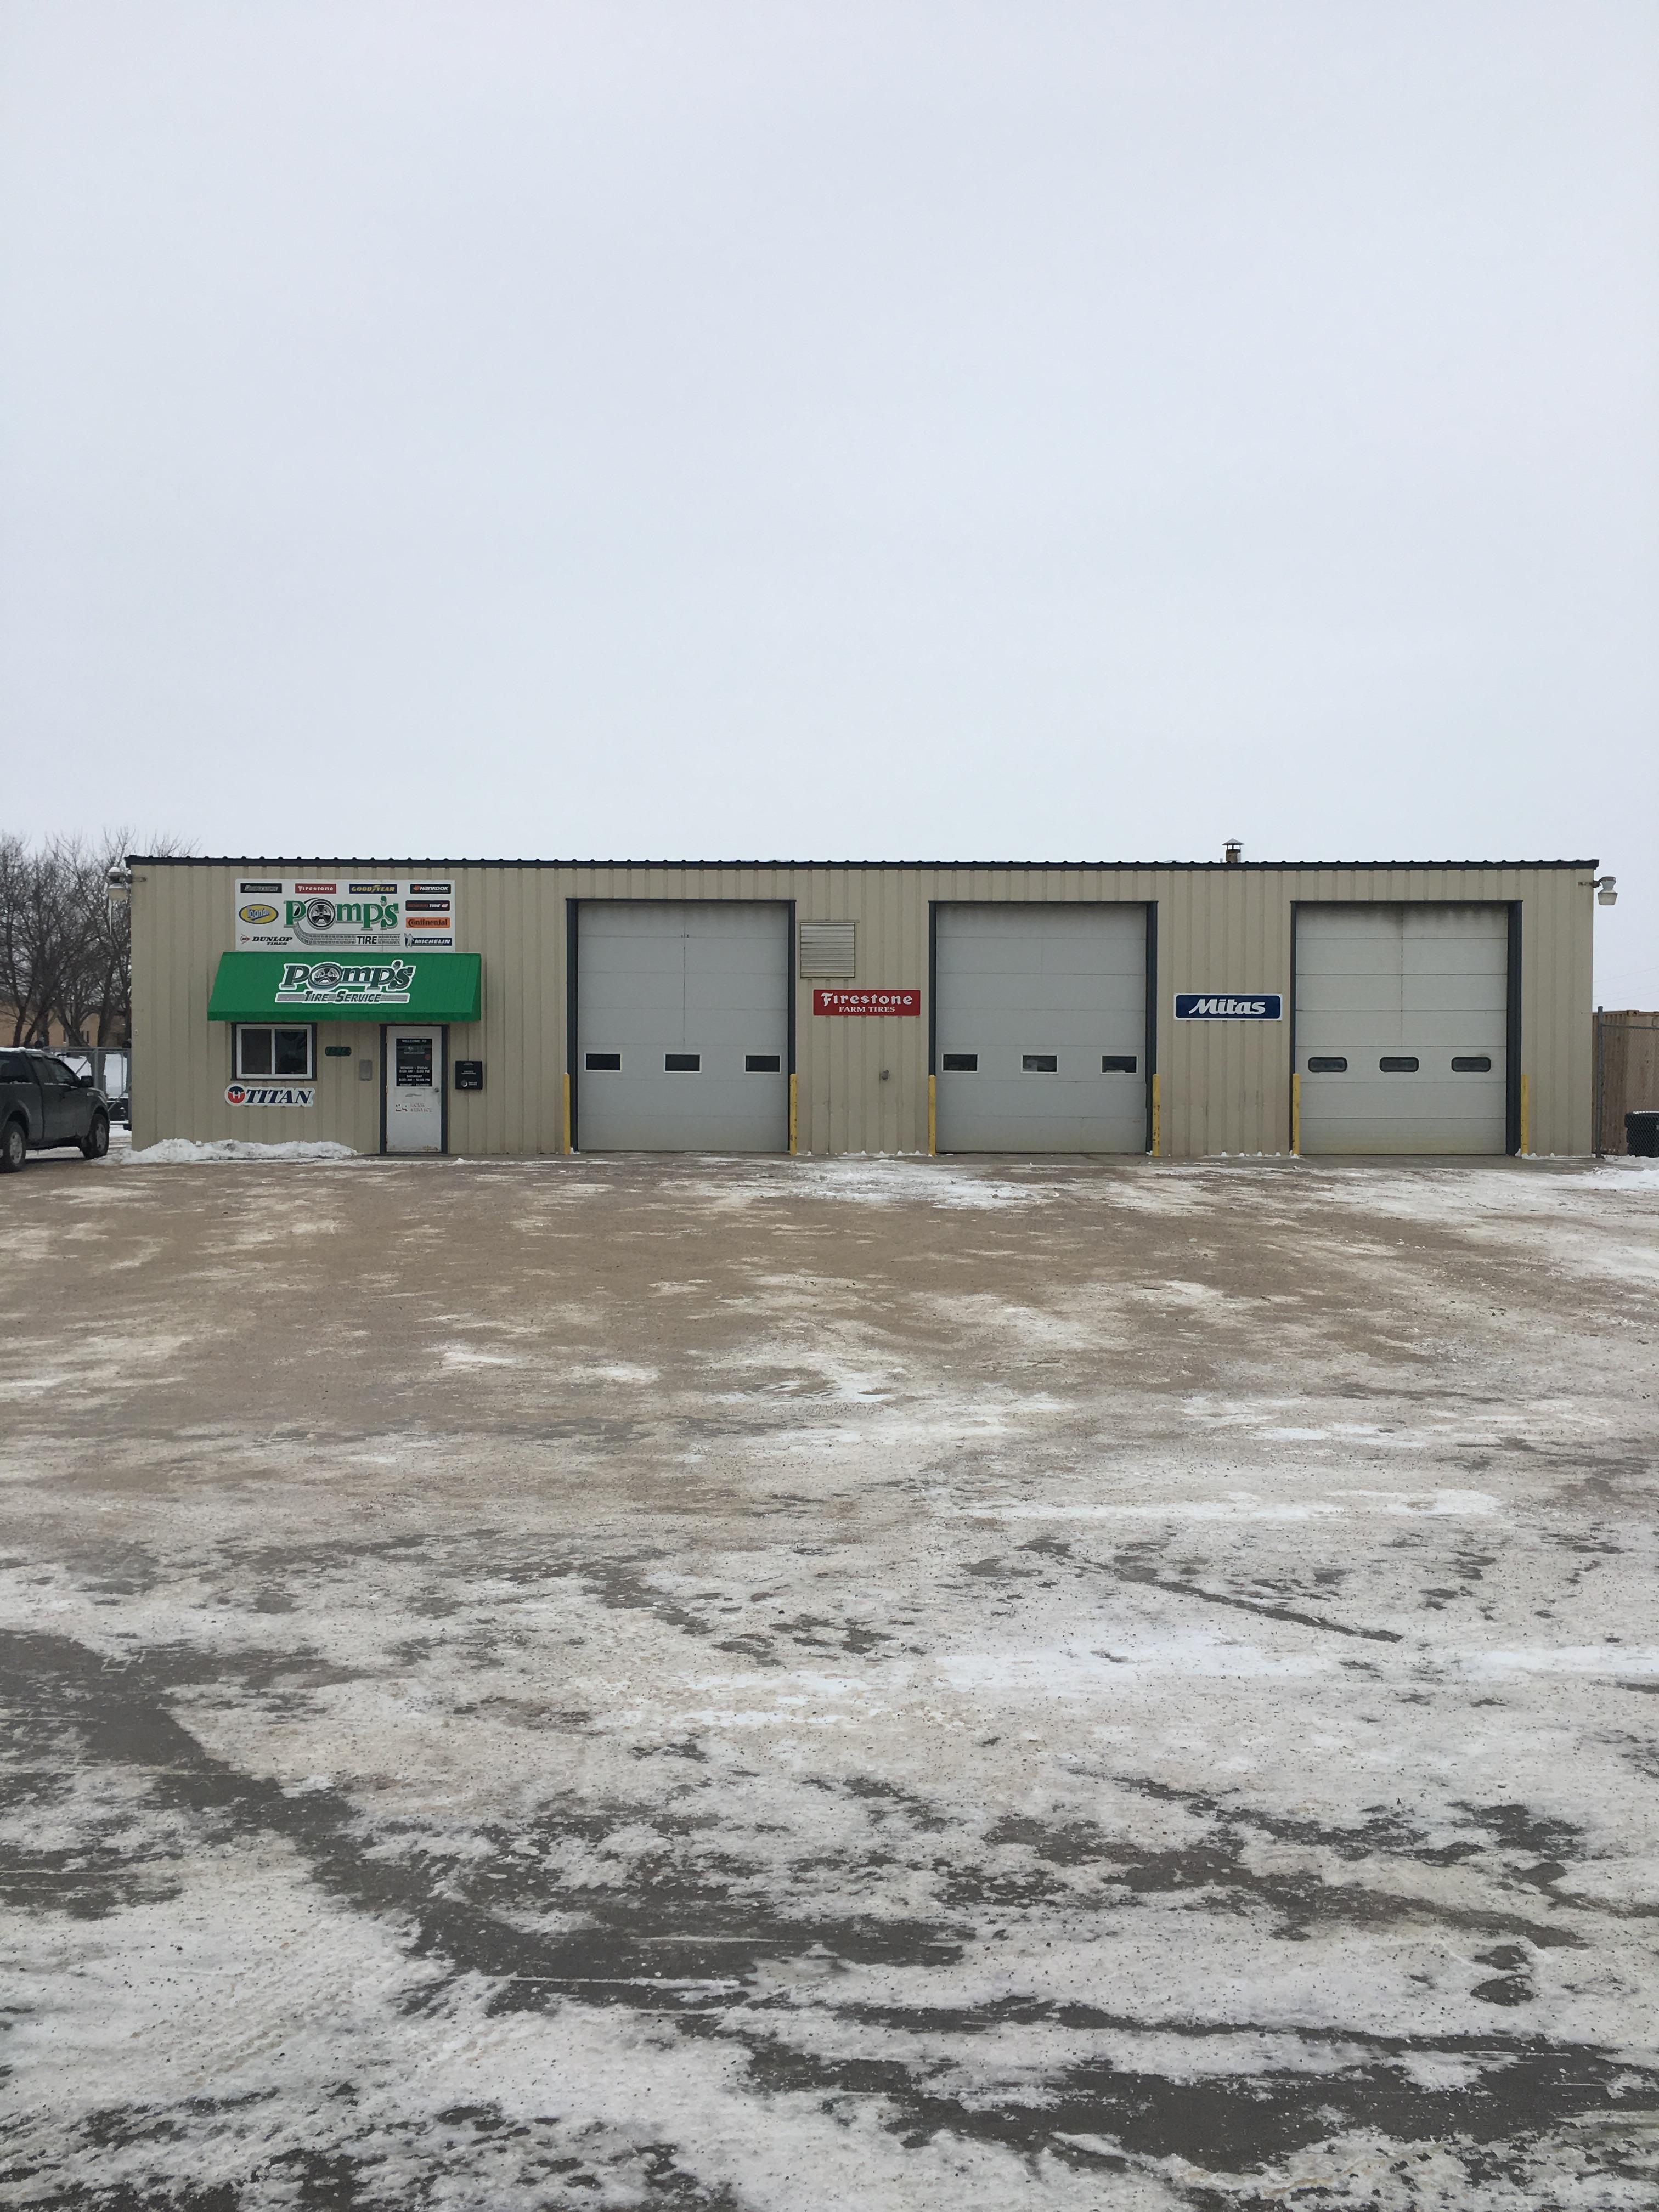 Firestone Hours Sunday >> Pomp S Tire Locate Your Nearest Midwestern Tire Auto Shop